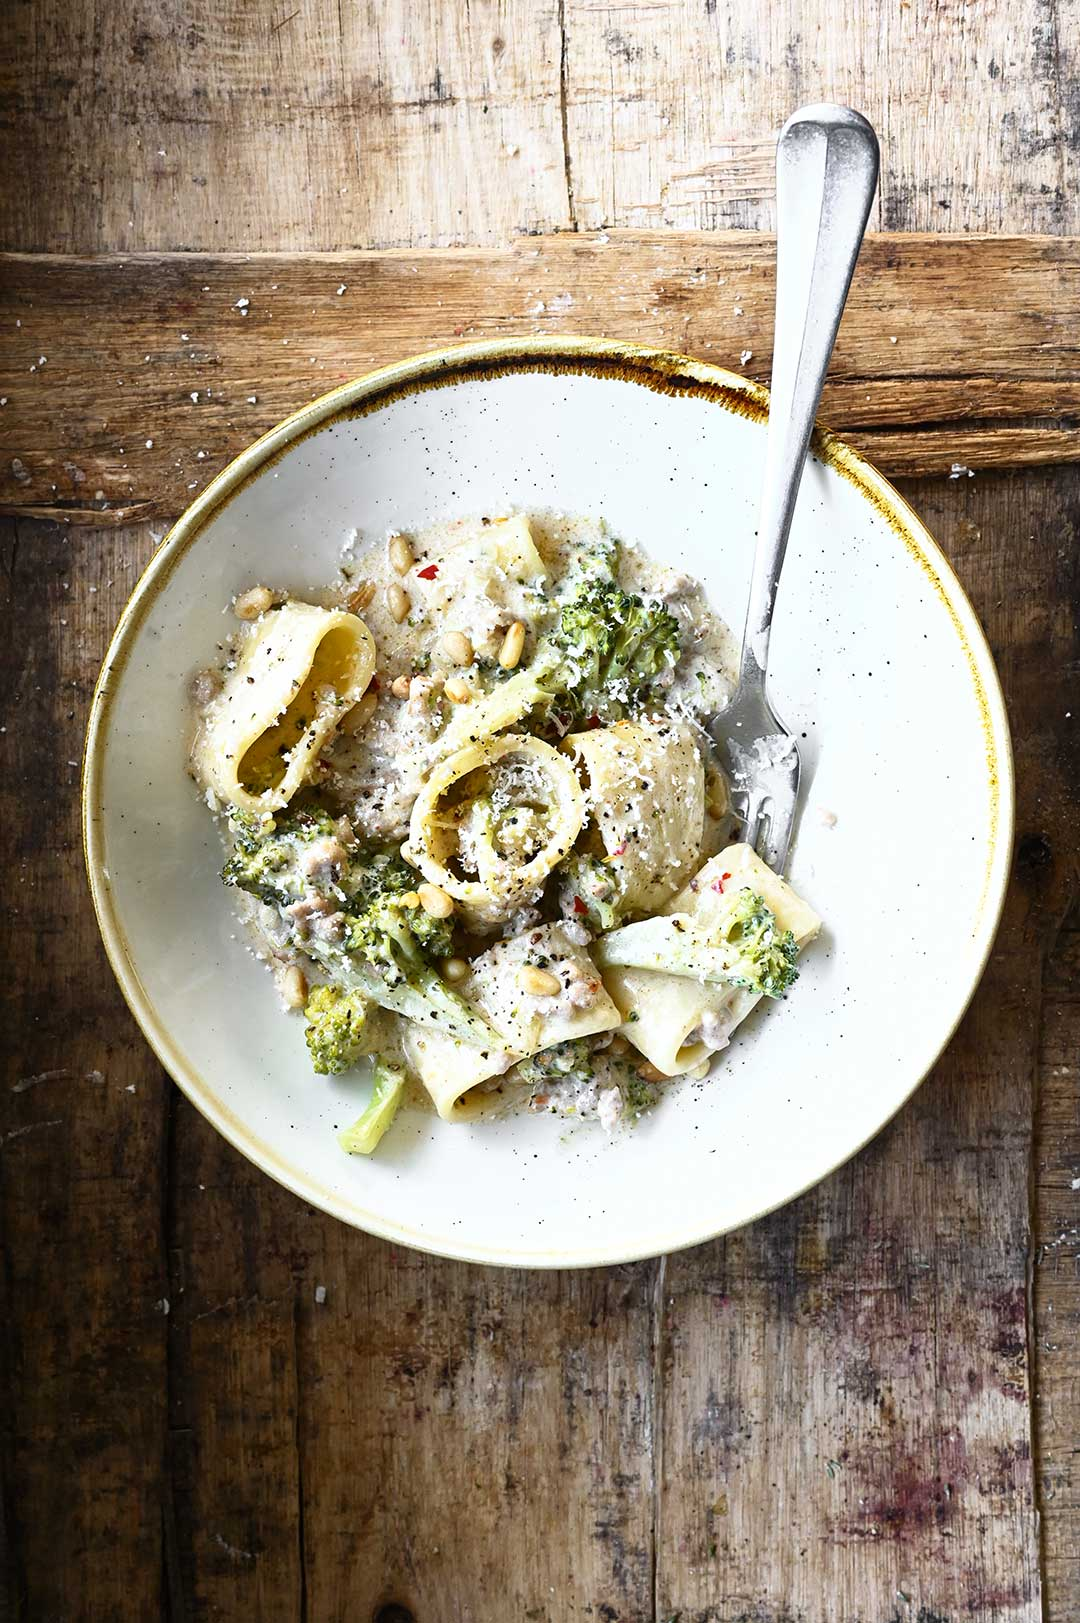 creamy pasta with pork and broccoli